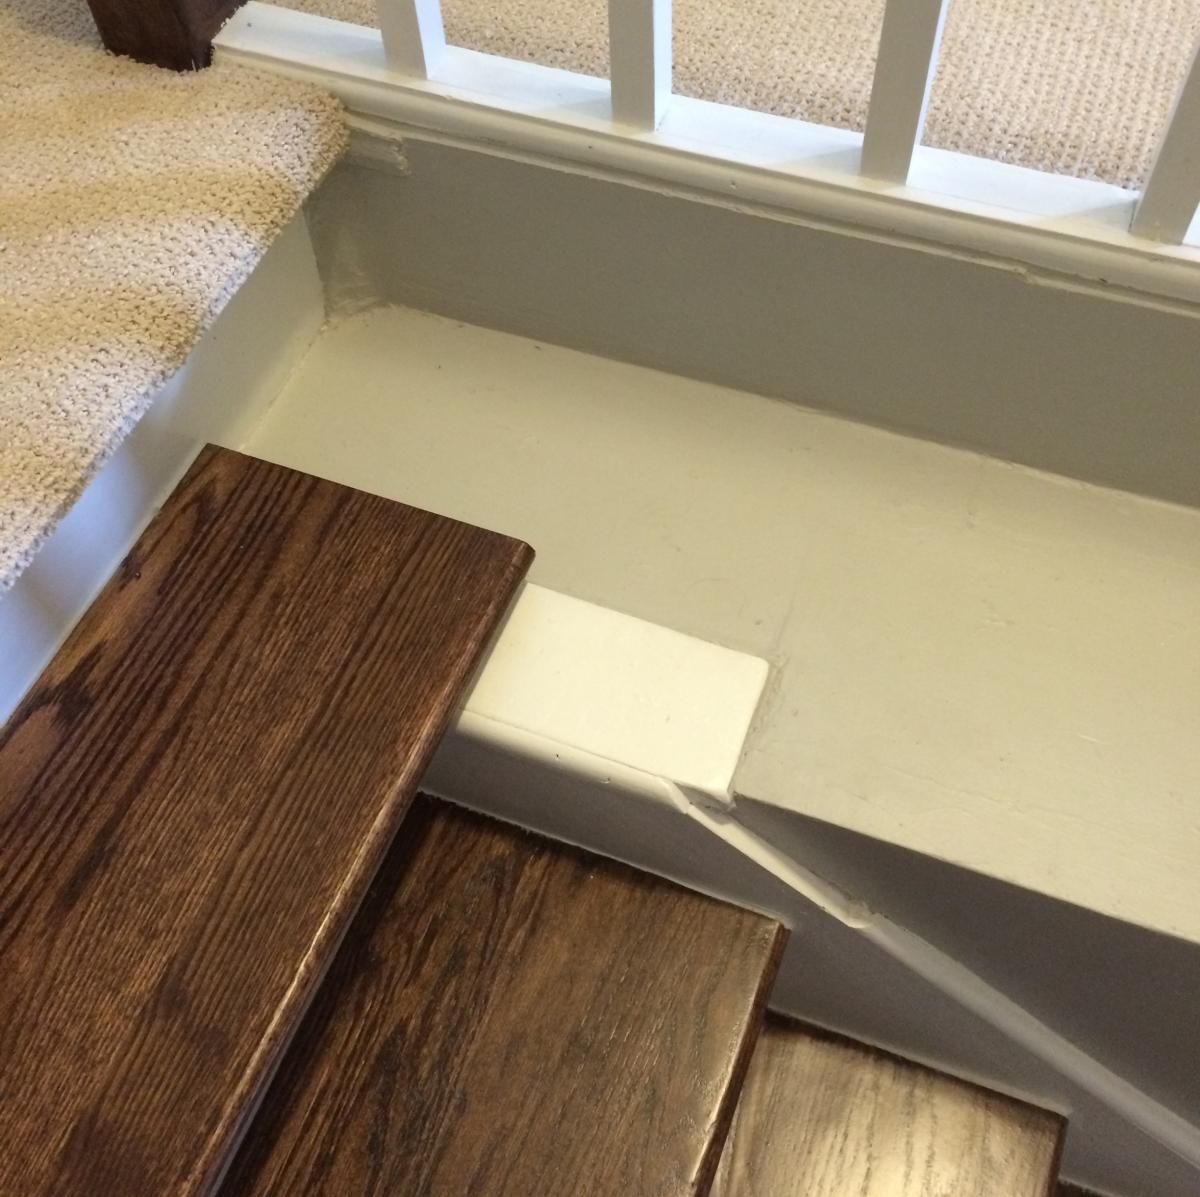 WOS_stair detail